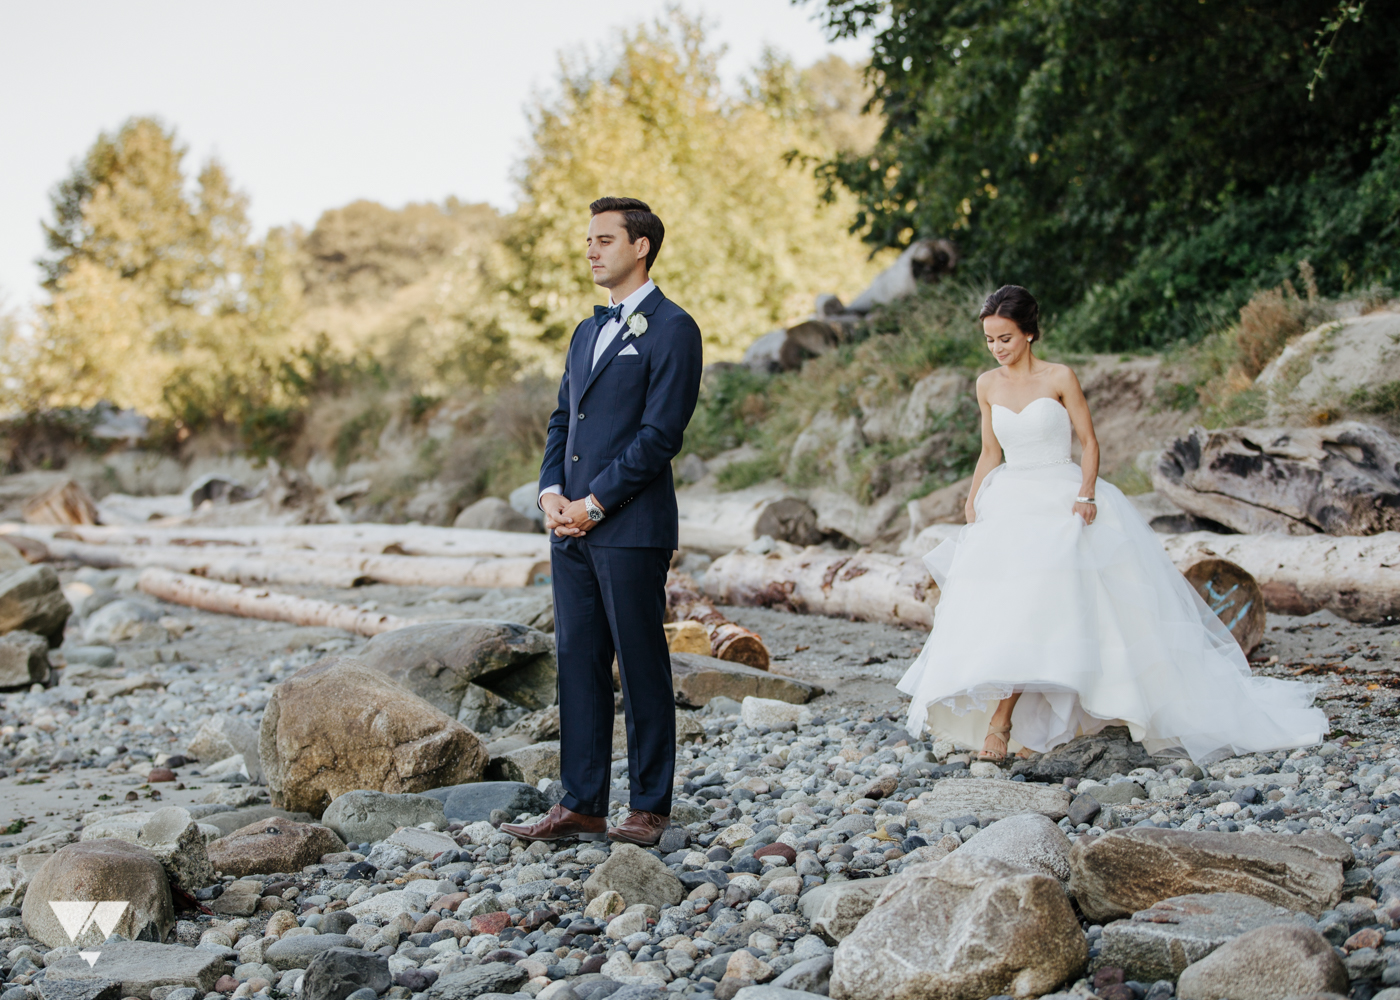 herafilms_carlotta_alex_wedding_hera_web-21.jpg